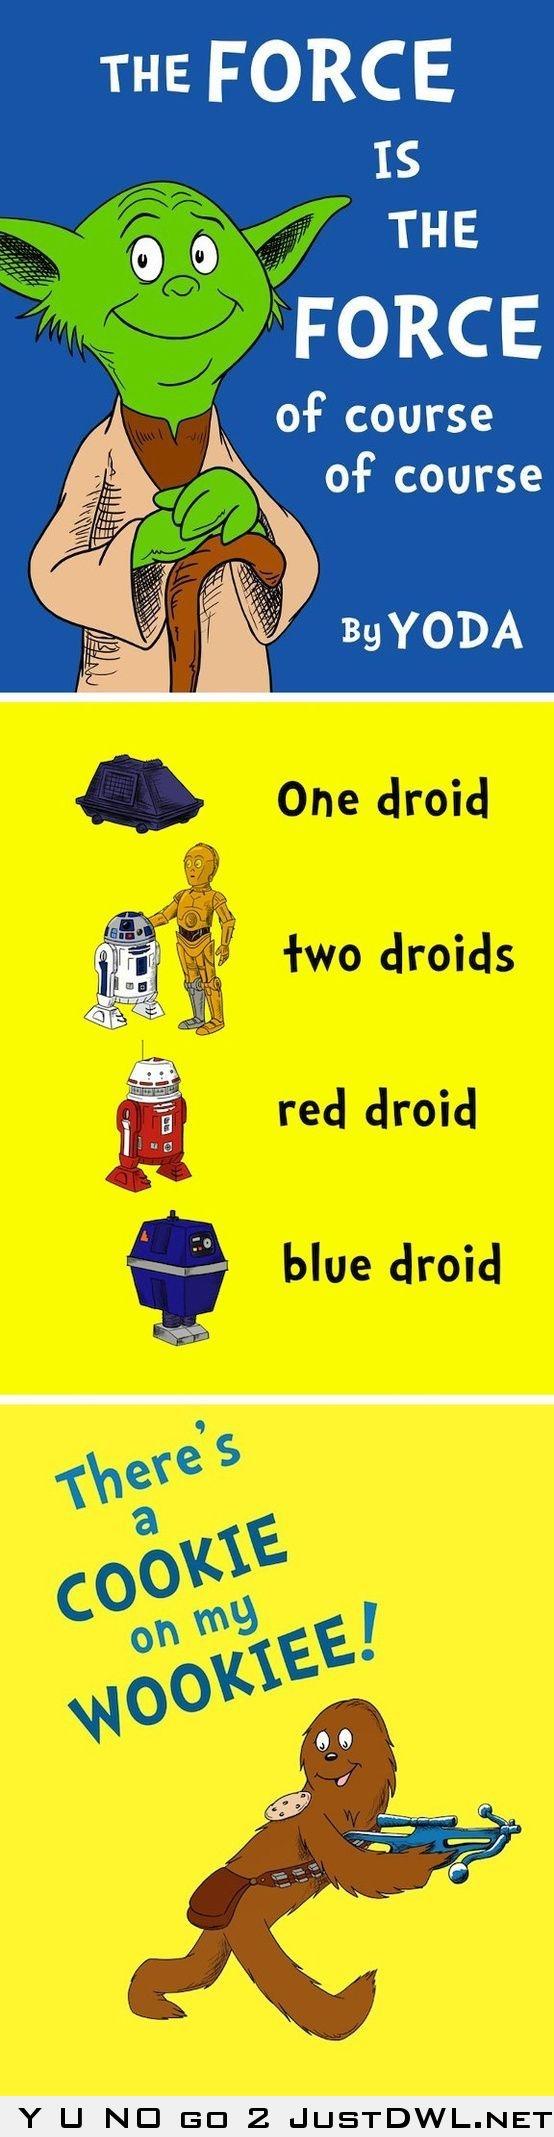 best Star wars images on Pinterest Star wars Star wars party